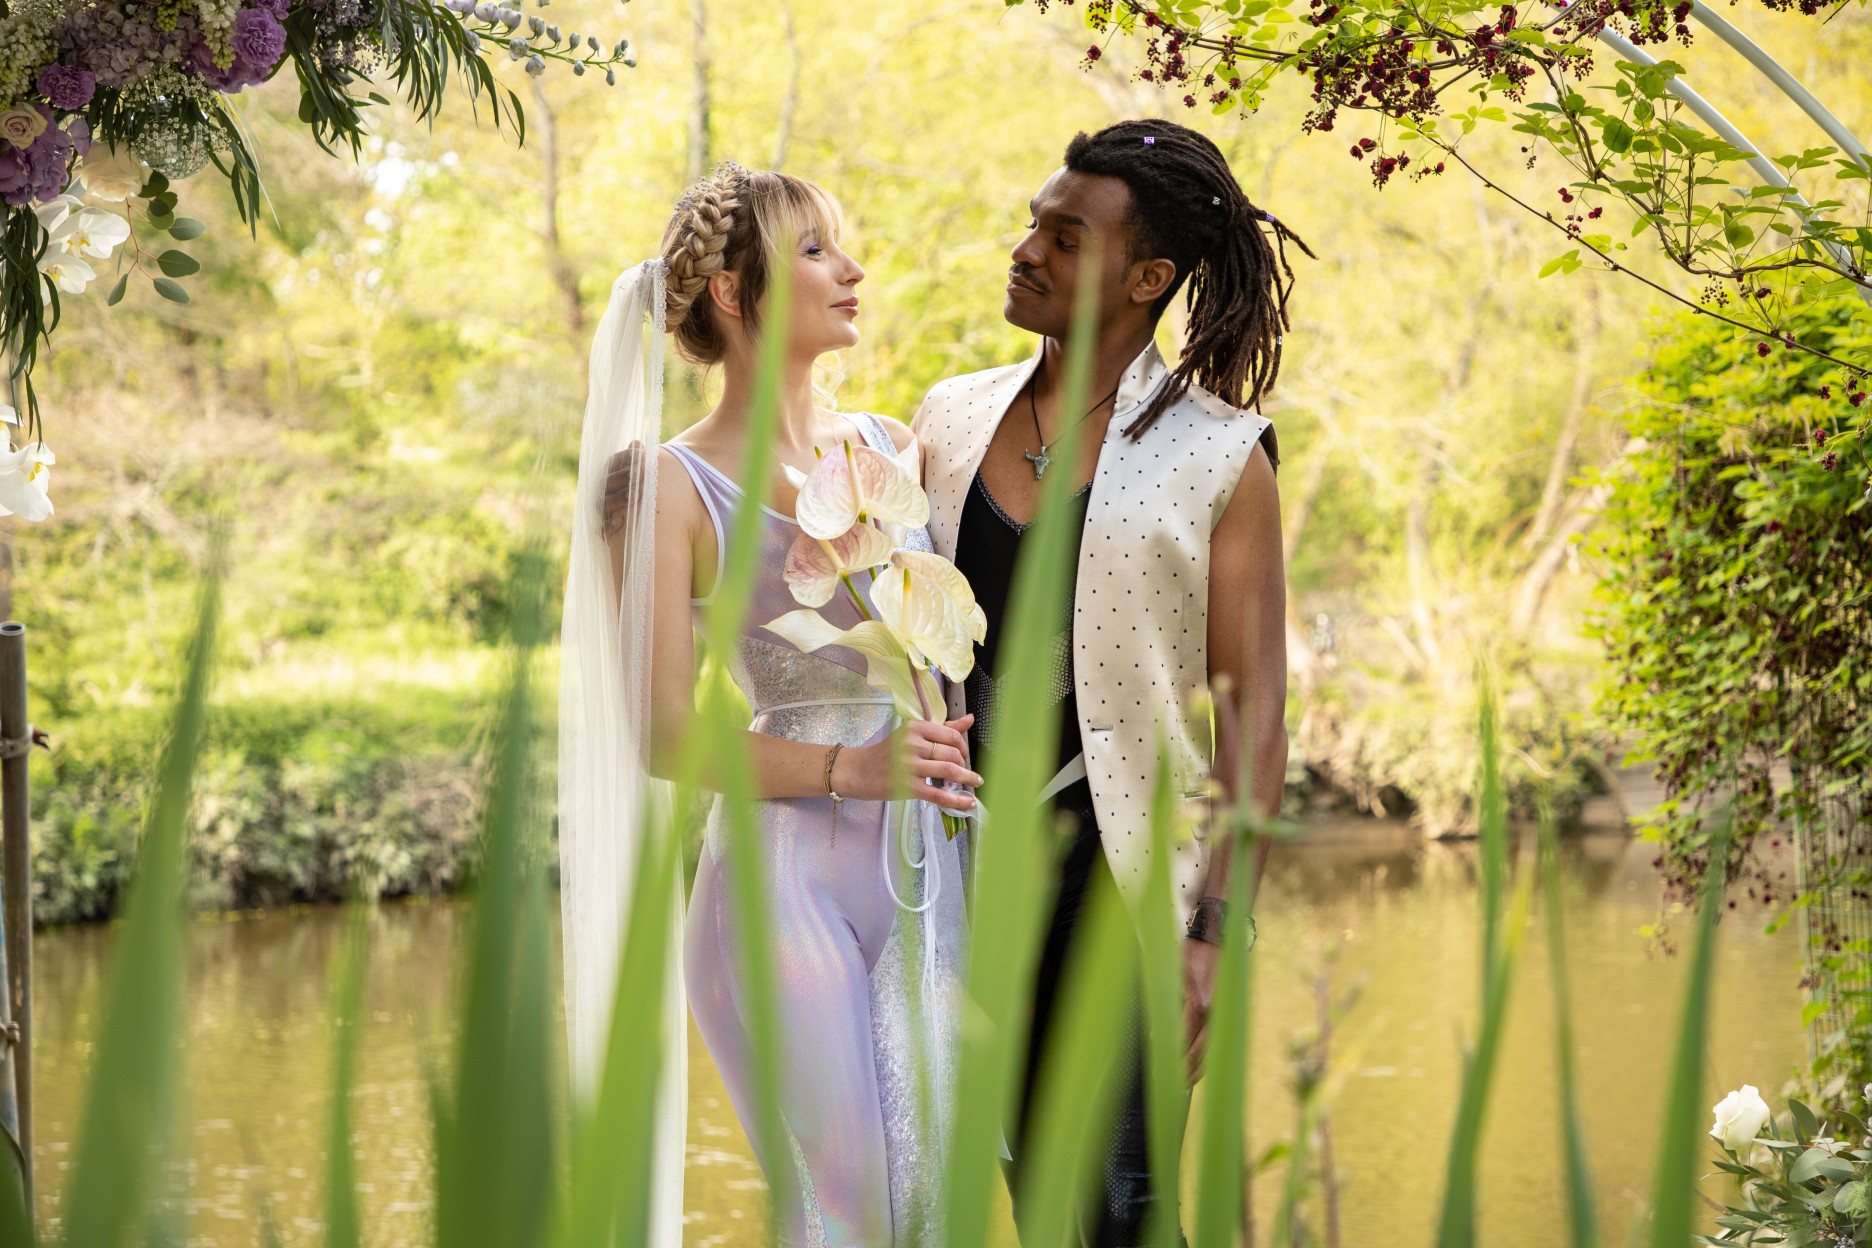 outdoor wedding inspiration - modern festival wedding - unique wedding wear - wedding jumpsuit - wedding catsuit - festival bride - unique wedding wear - creative wedding photography